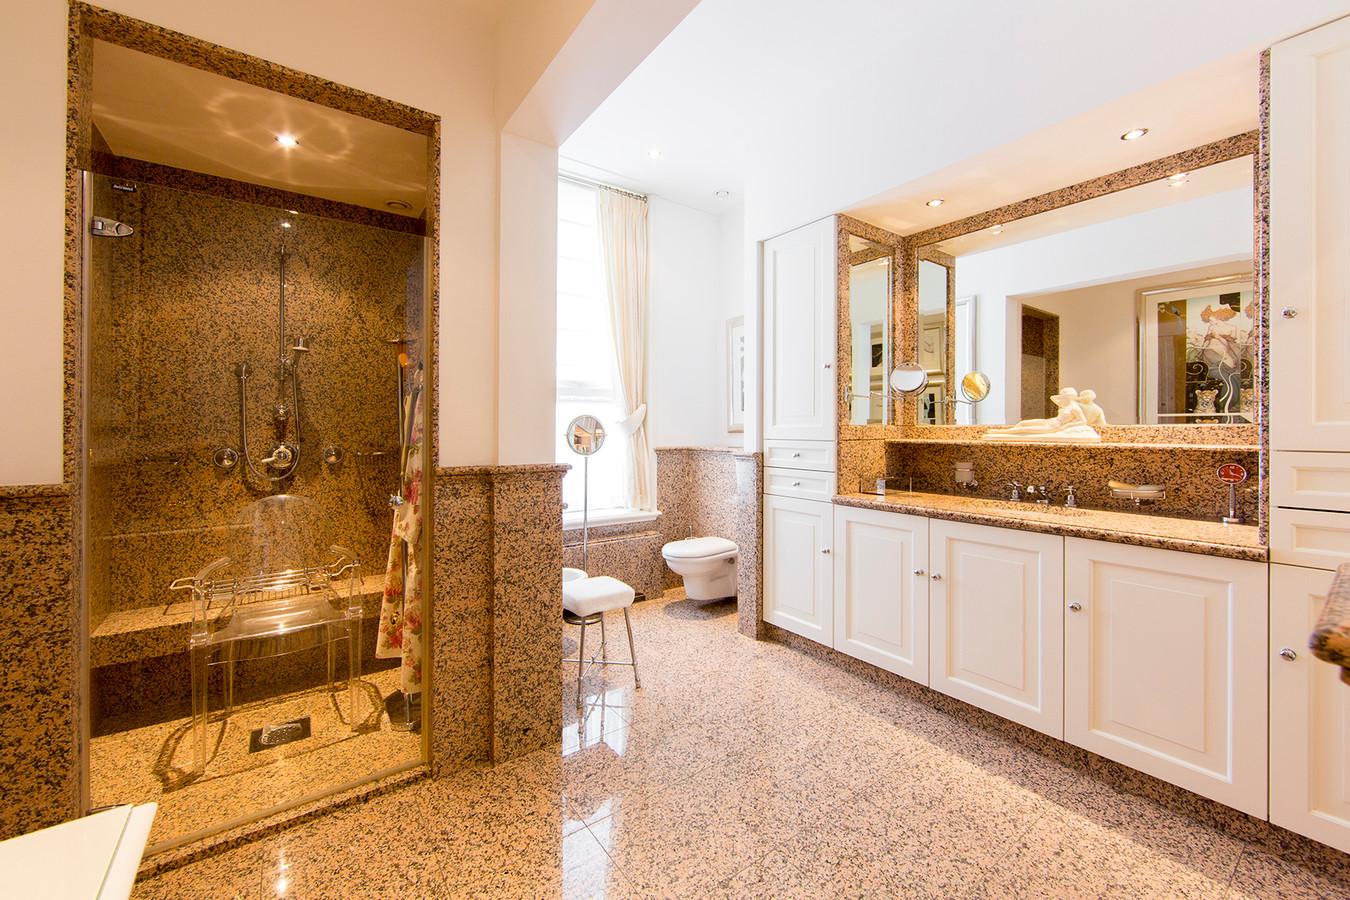 De woning heeft twee in marmer uitgevoerde badkamers met ligbad, inloopdouche, wc en bidet.